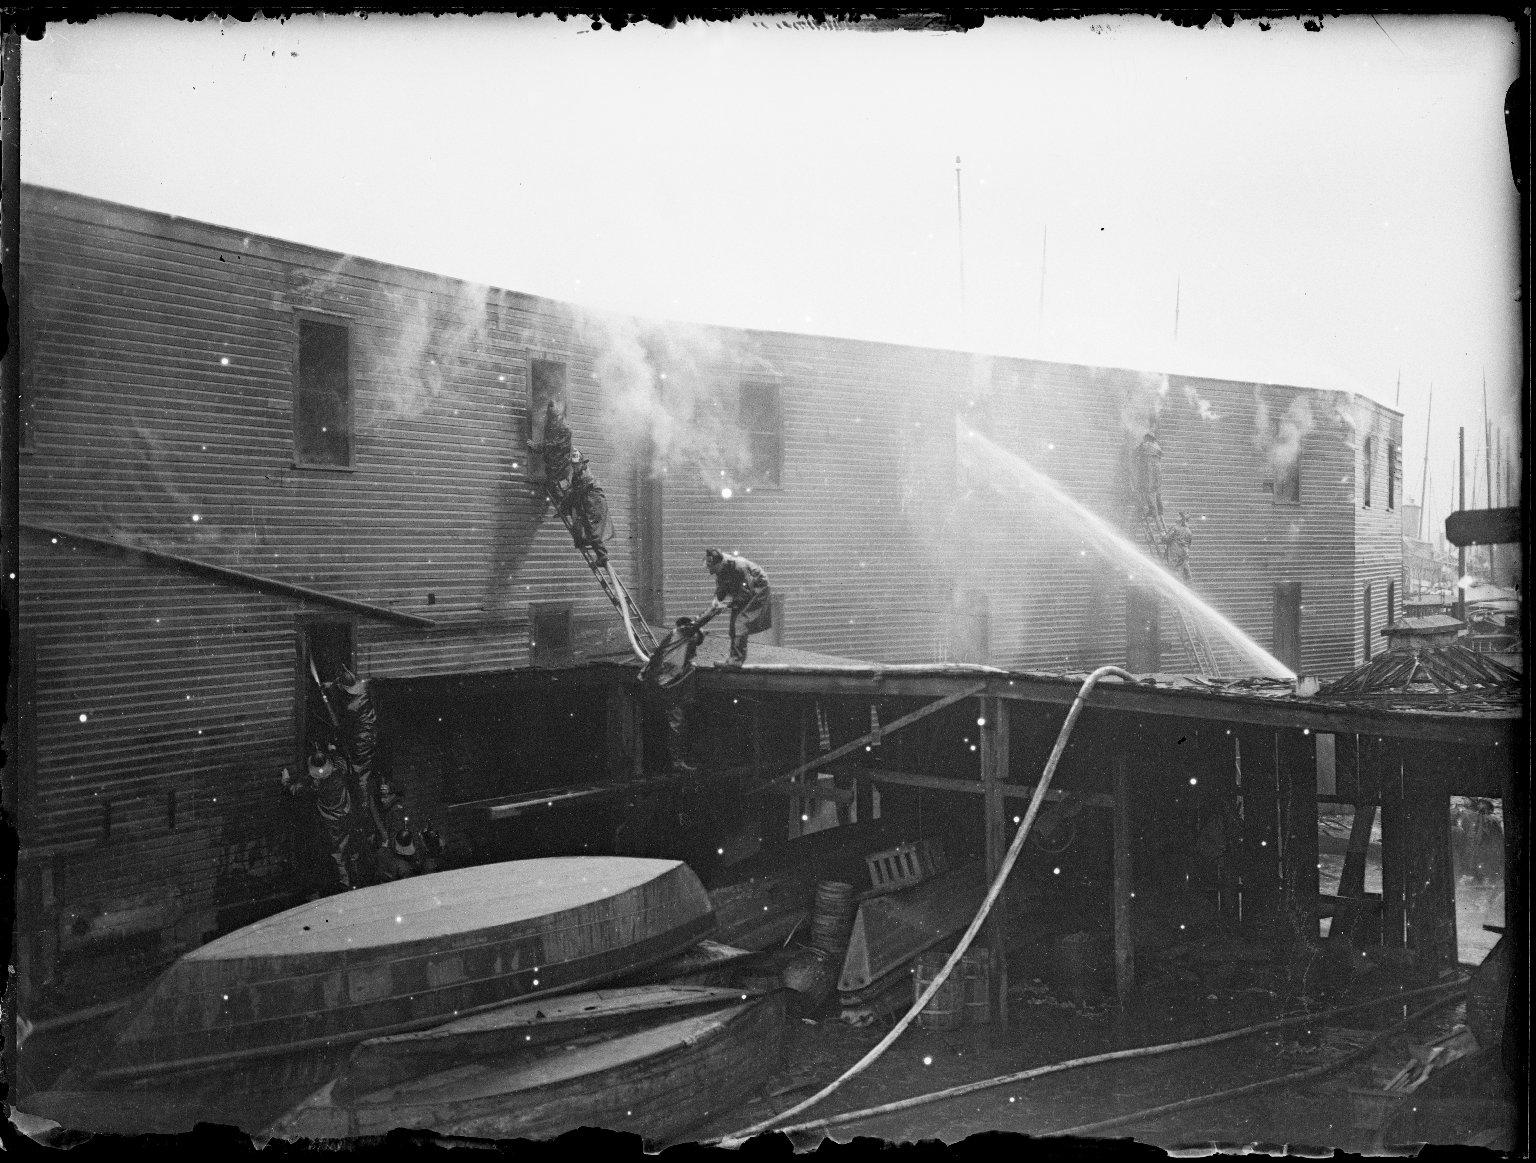 Пожар на судоверфи. Нью-Йорк, США